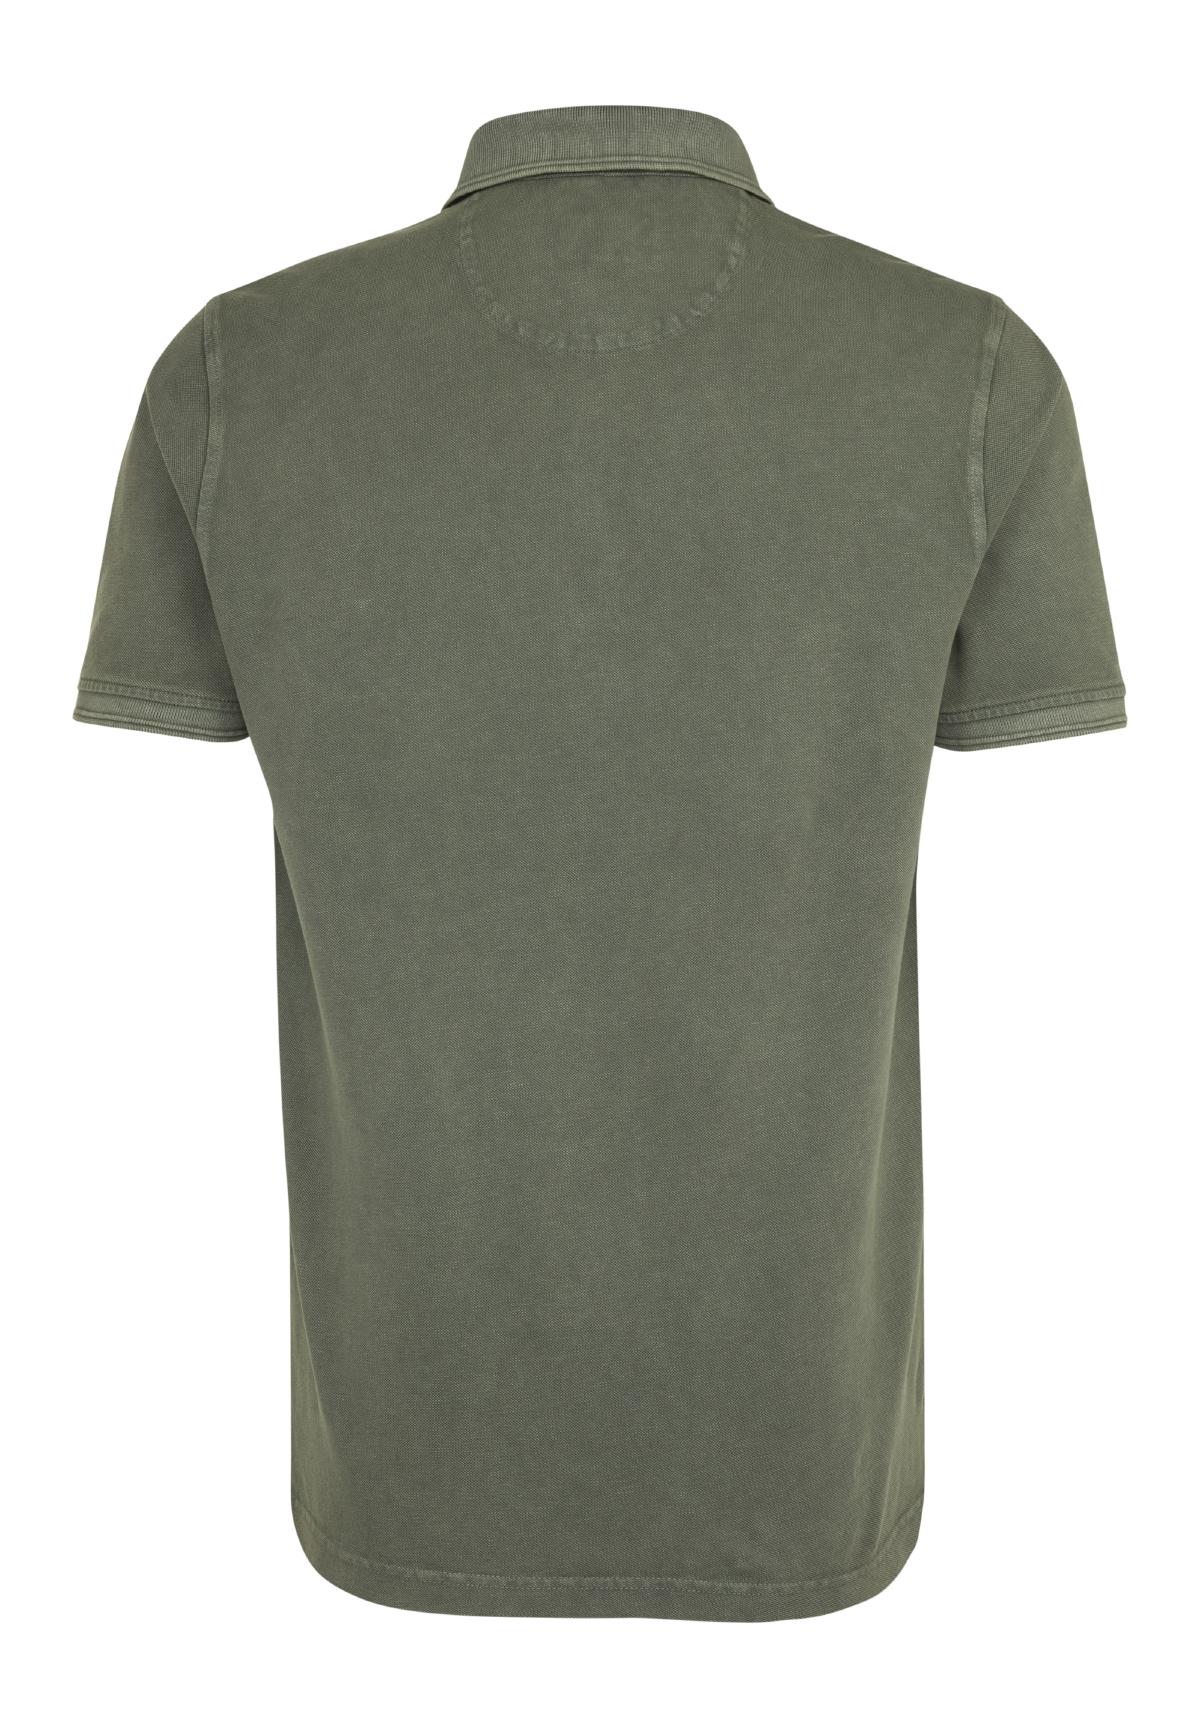 Camel-Active-Herren-Shirt-Poloshirt-Pique-Regular-Fit-NEU Indexbild 78